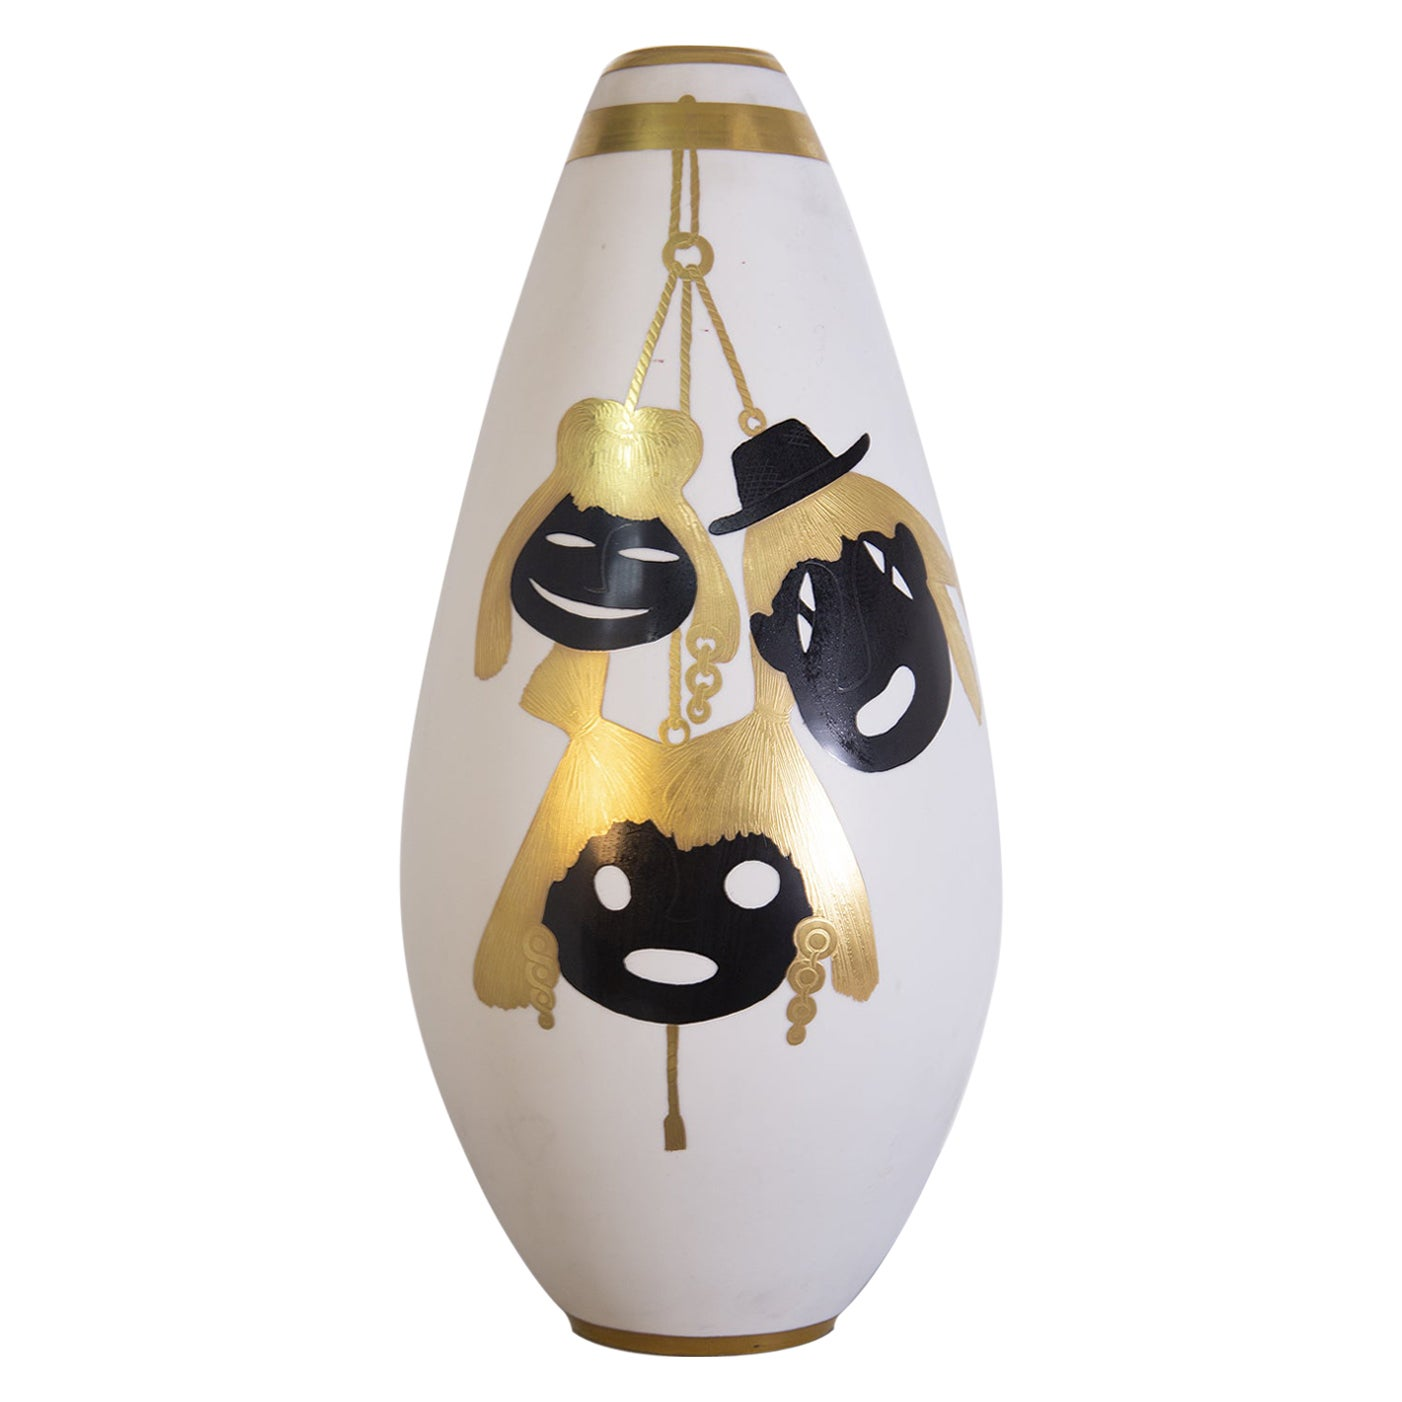 Precious Va by Arrigo Finzi in Pure Gold and Porcelain, Original Label, 1950s